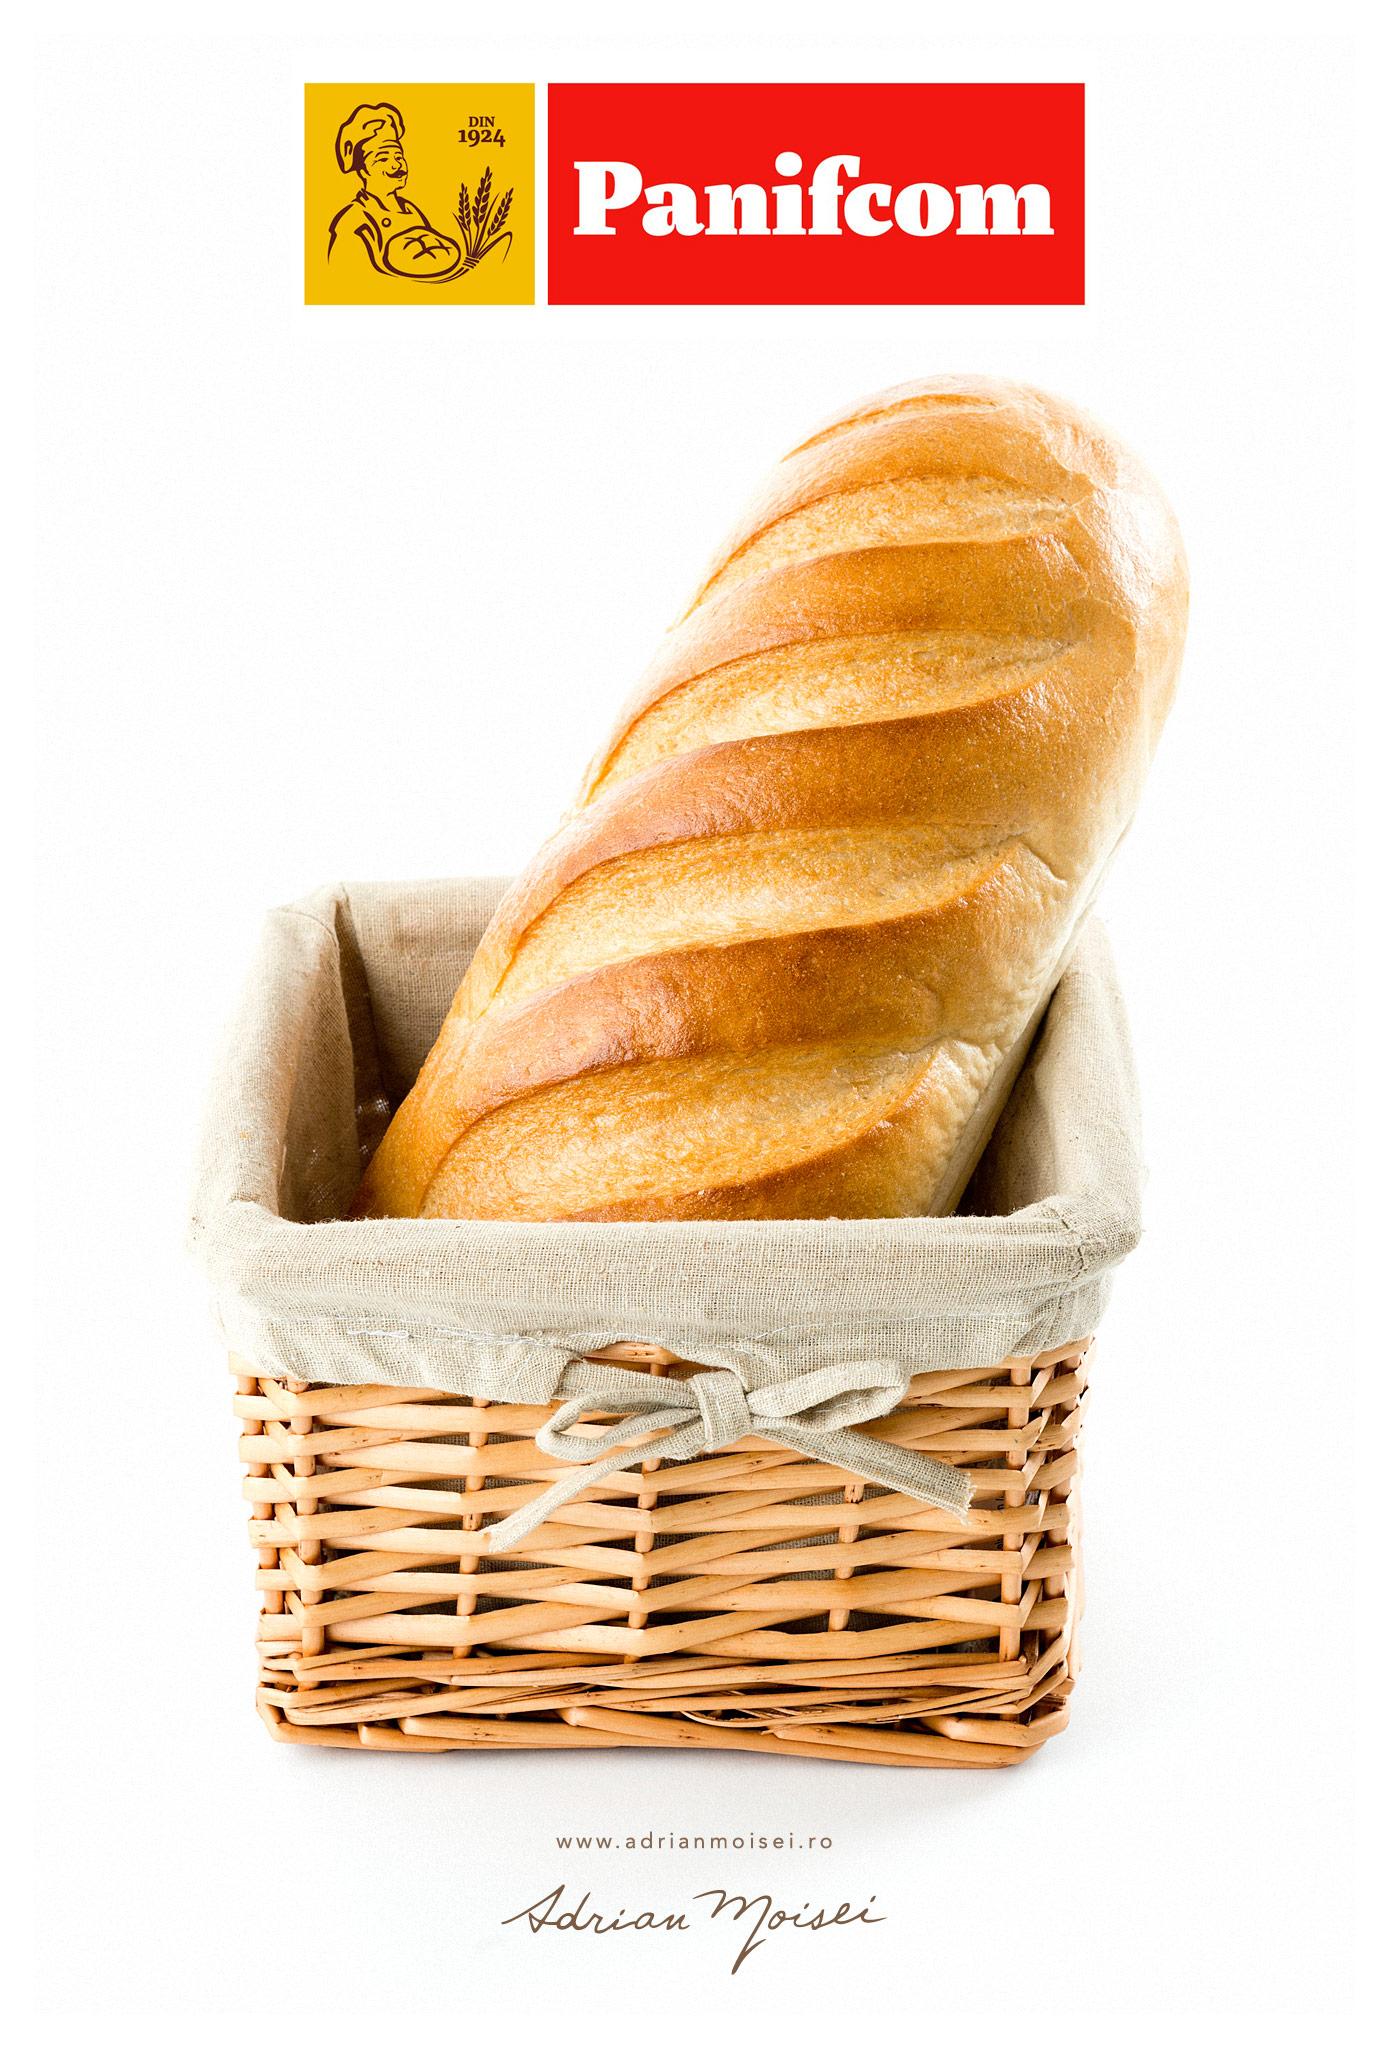 Fotografie de produs Iasi: Painea Panifcom Iasi. Ai luat si paine? Adrian Moisei, fotograf Iasi